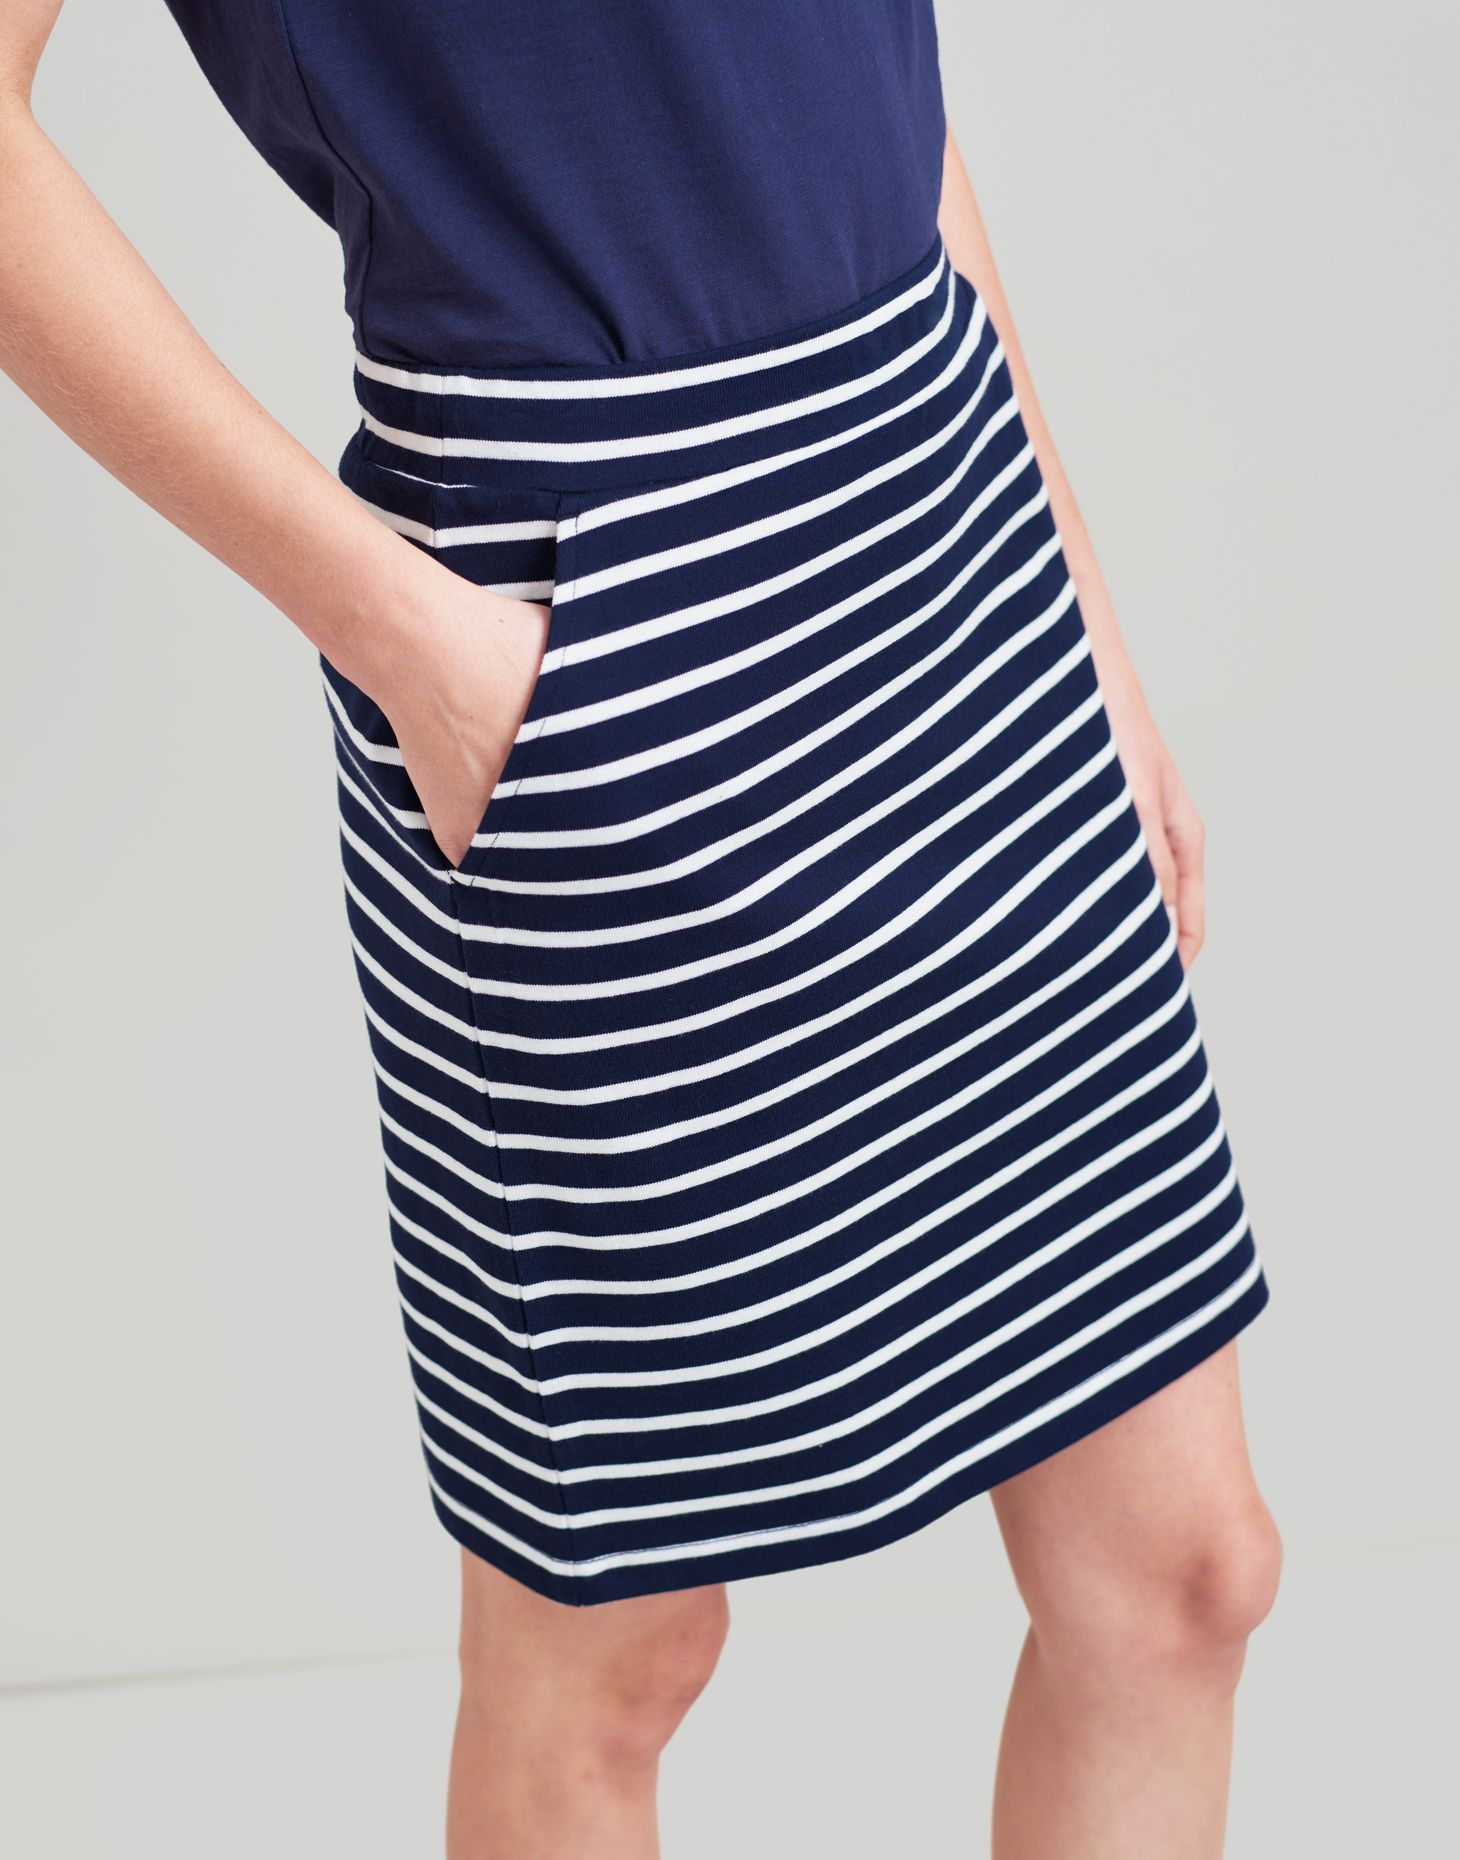 ec6d34c48b Portia NAVY CREAM STRIPE Jersey Skirt | Joules UK